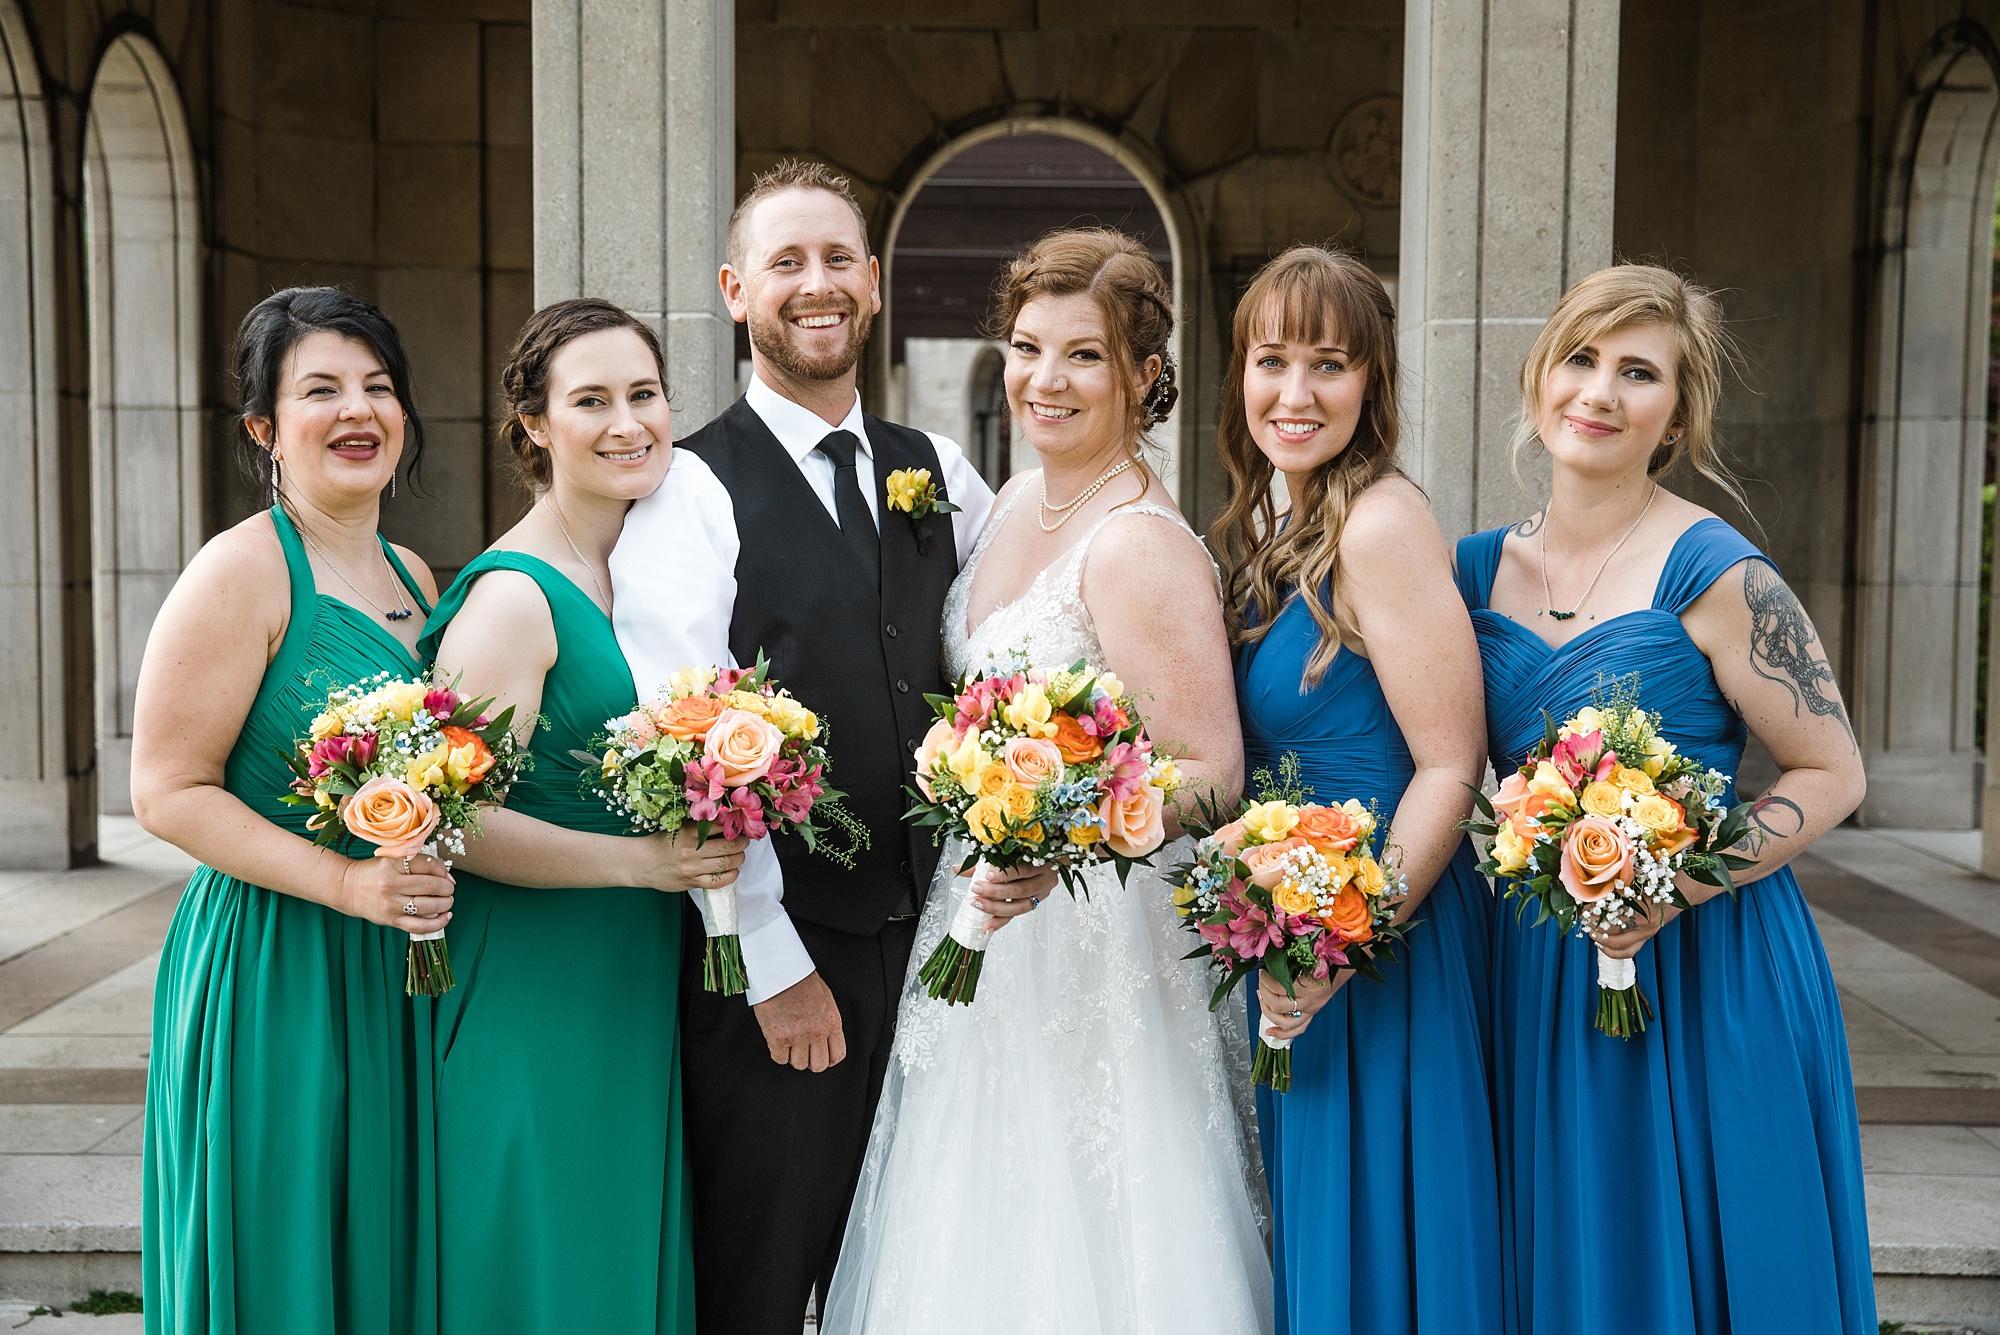 niagarafalls-weddingphotography_0044.jpg